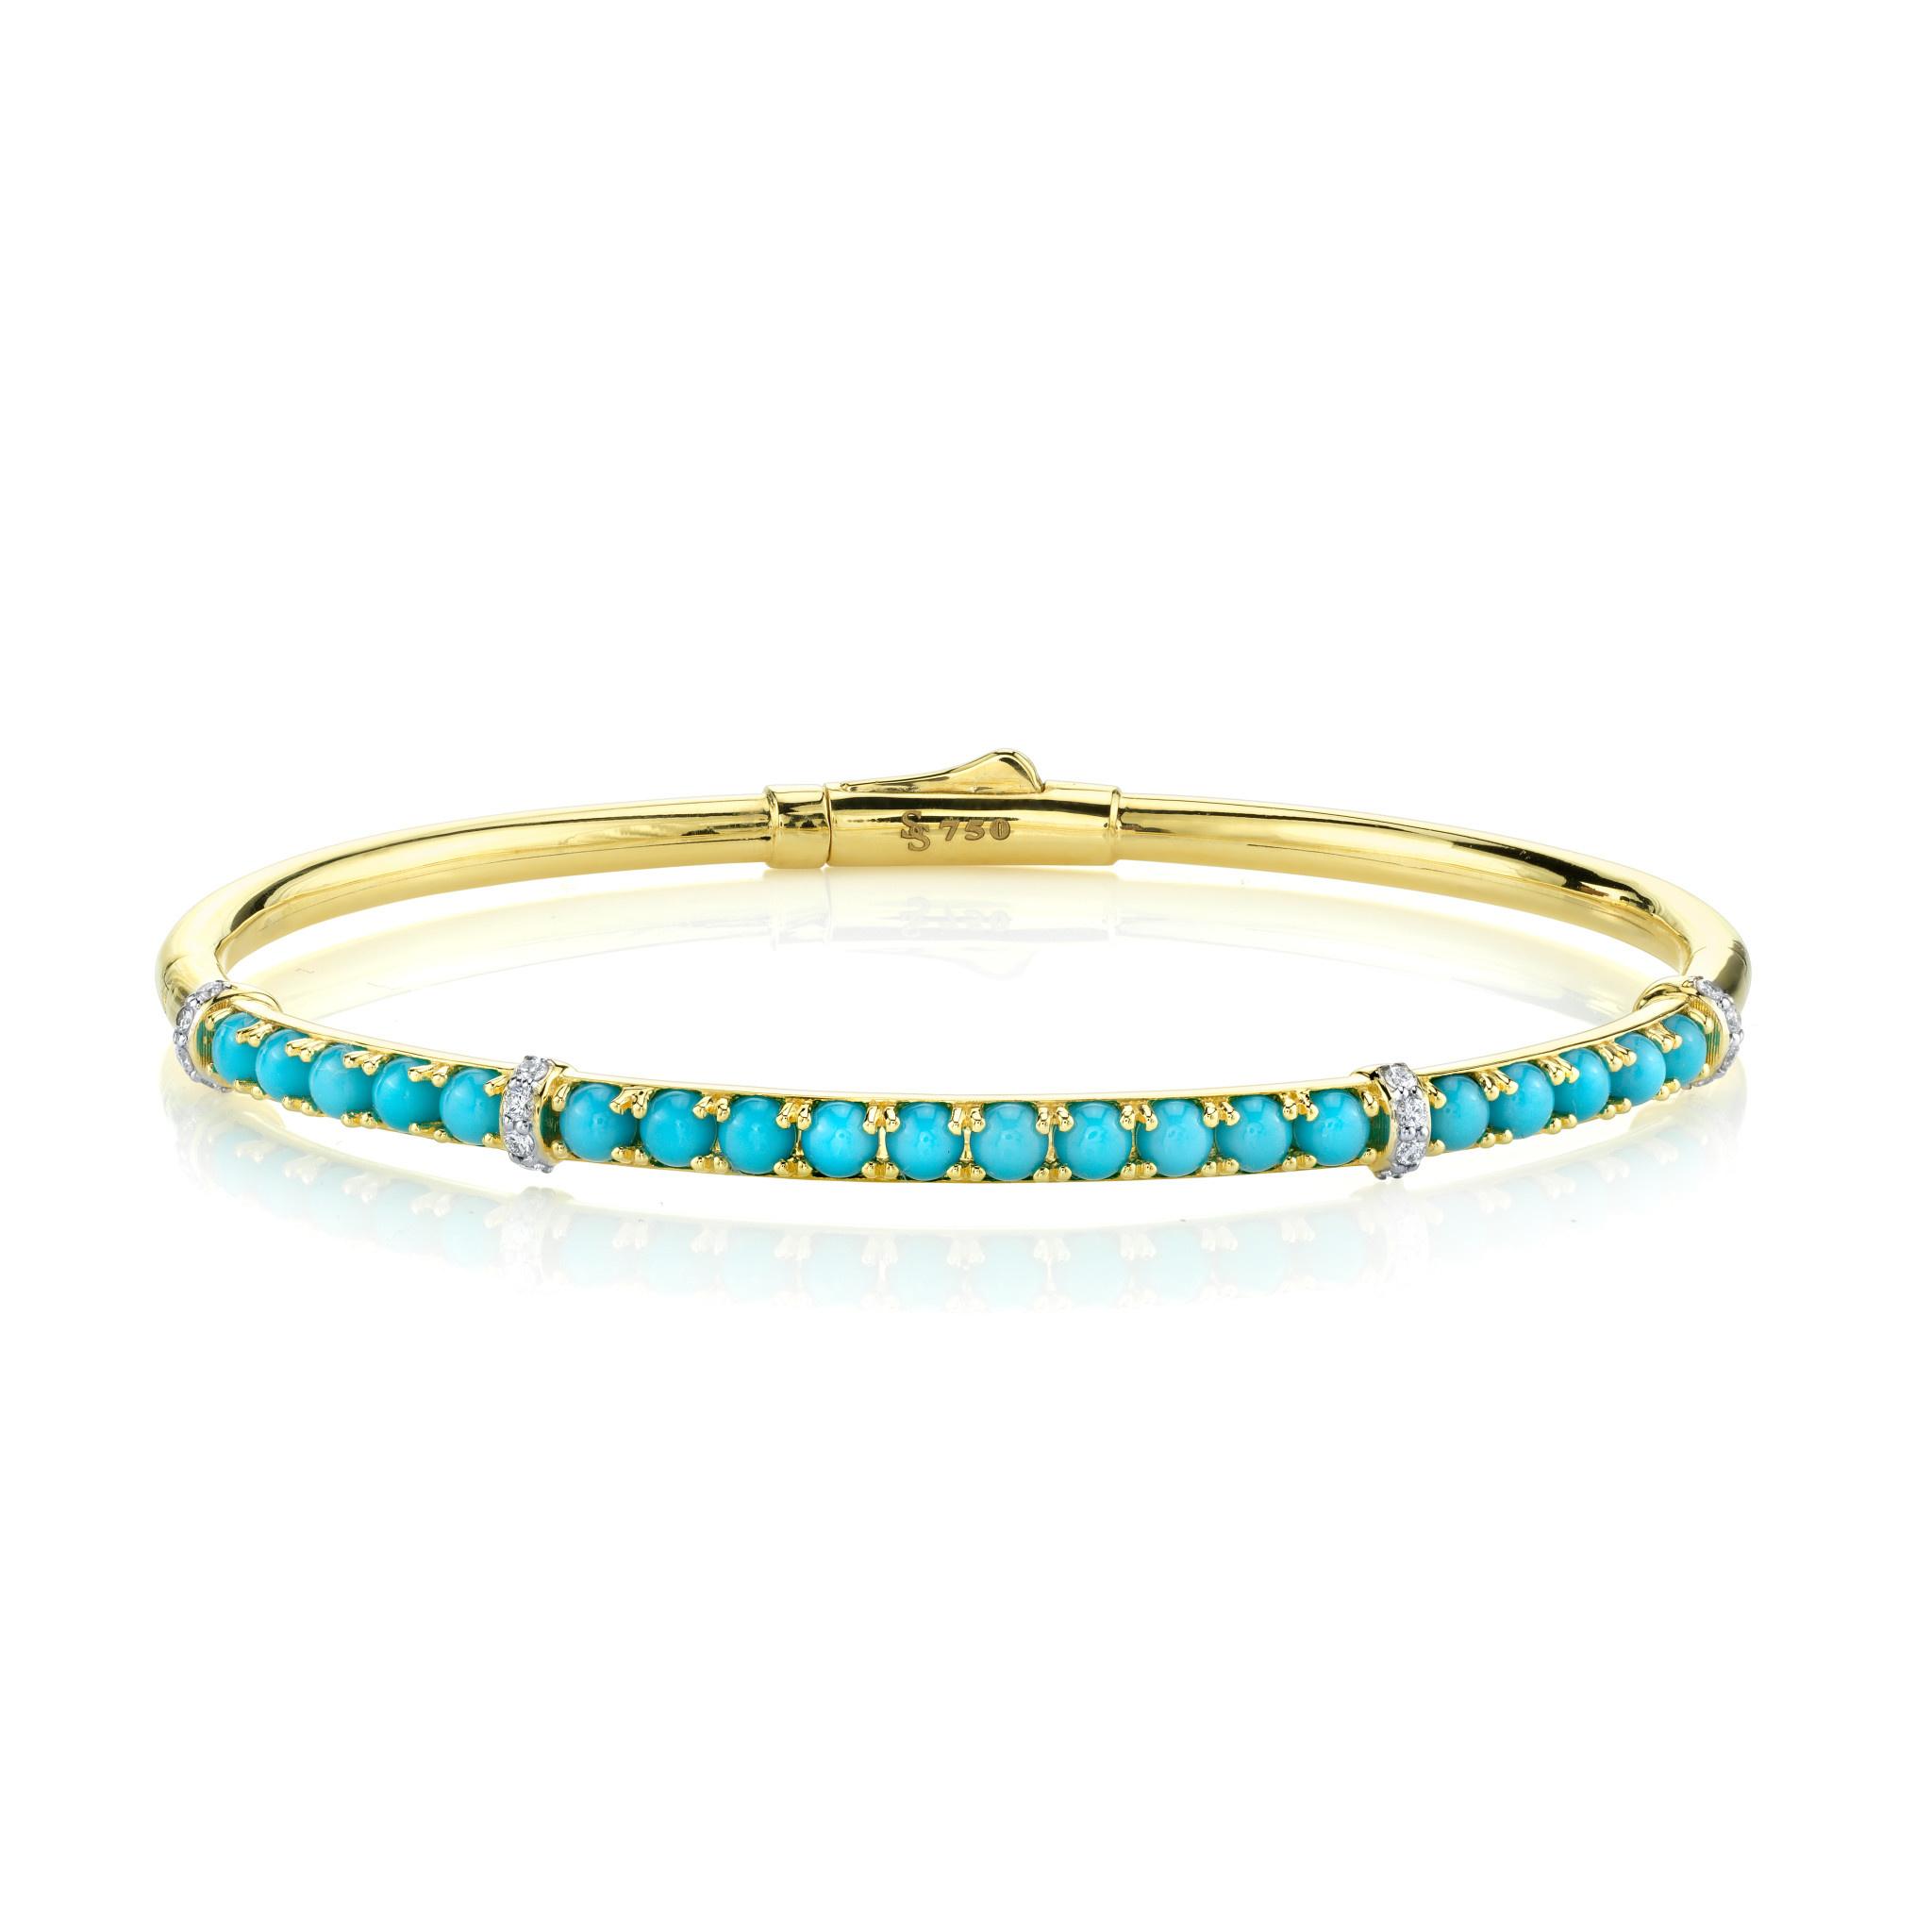 Turquoise and White Diamond Bracelet